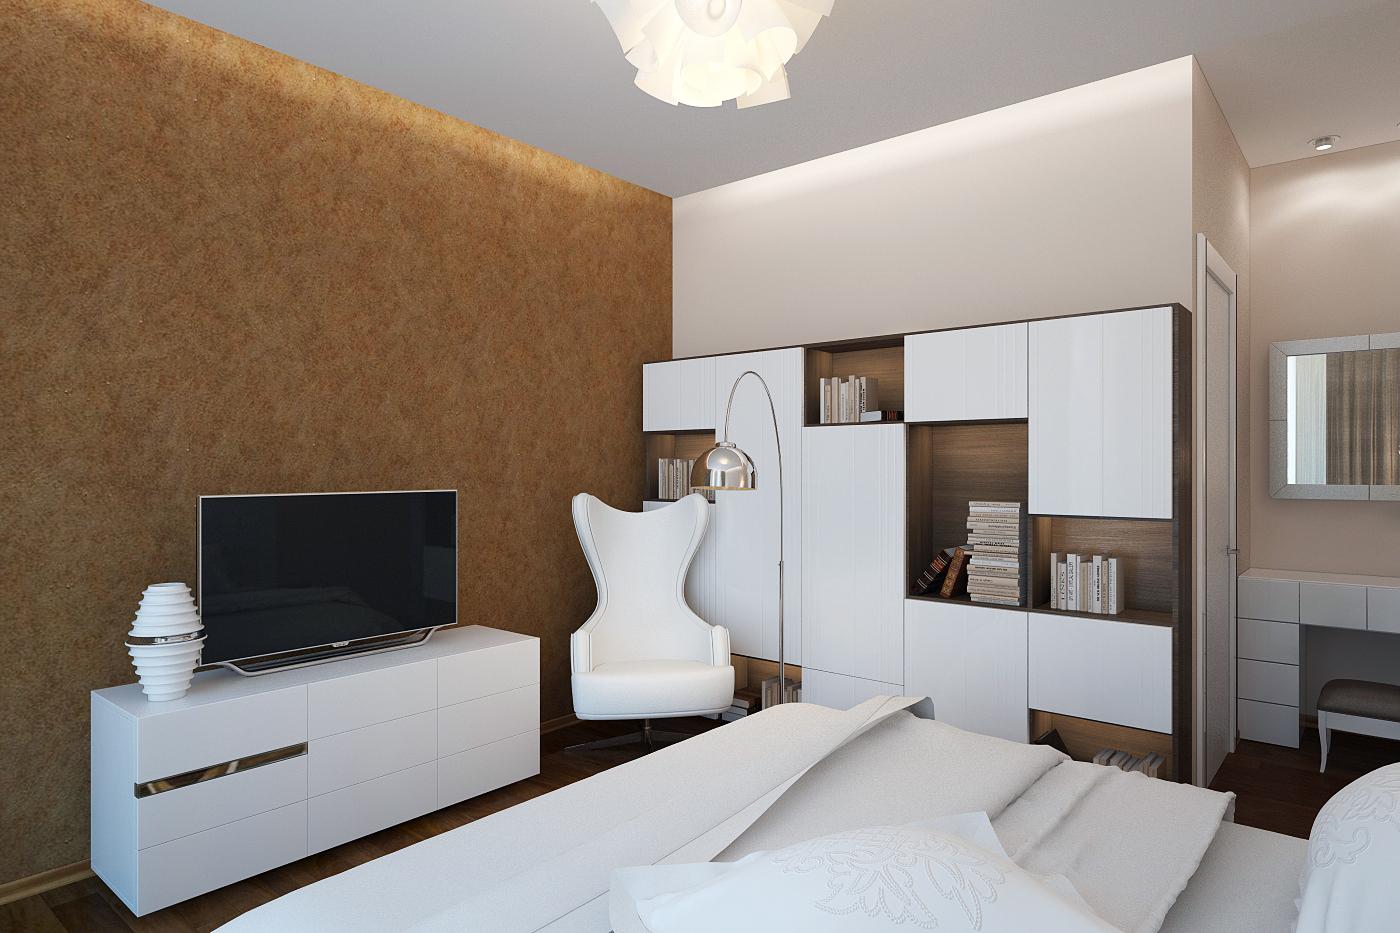 savremenen-interioren-proekt-za-dvustaen-apartament-60-m-7g